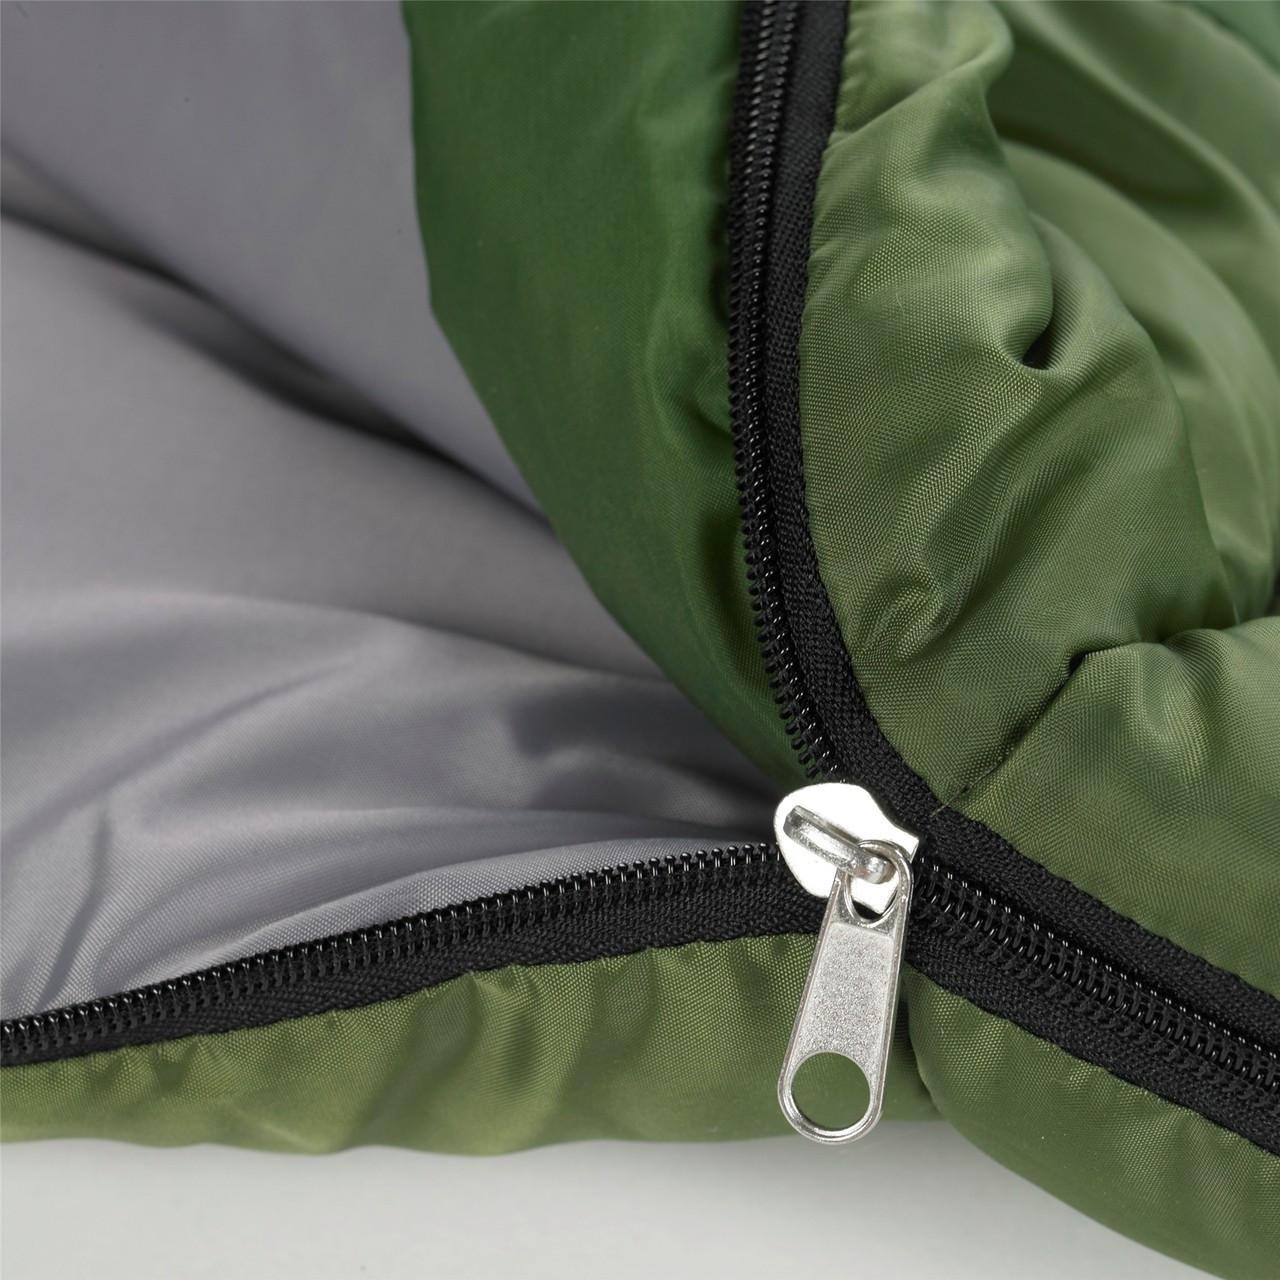 NEW Wenzel Backyard Boys 30 Degree Sleeping Bag Green FREE SHIPPING